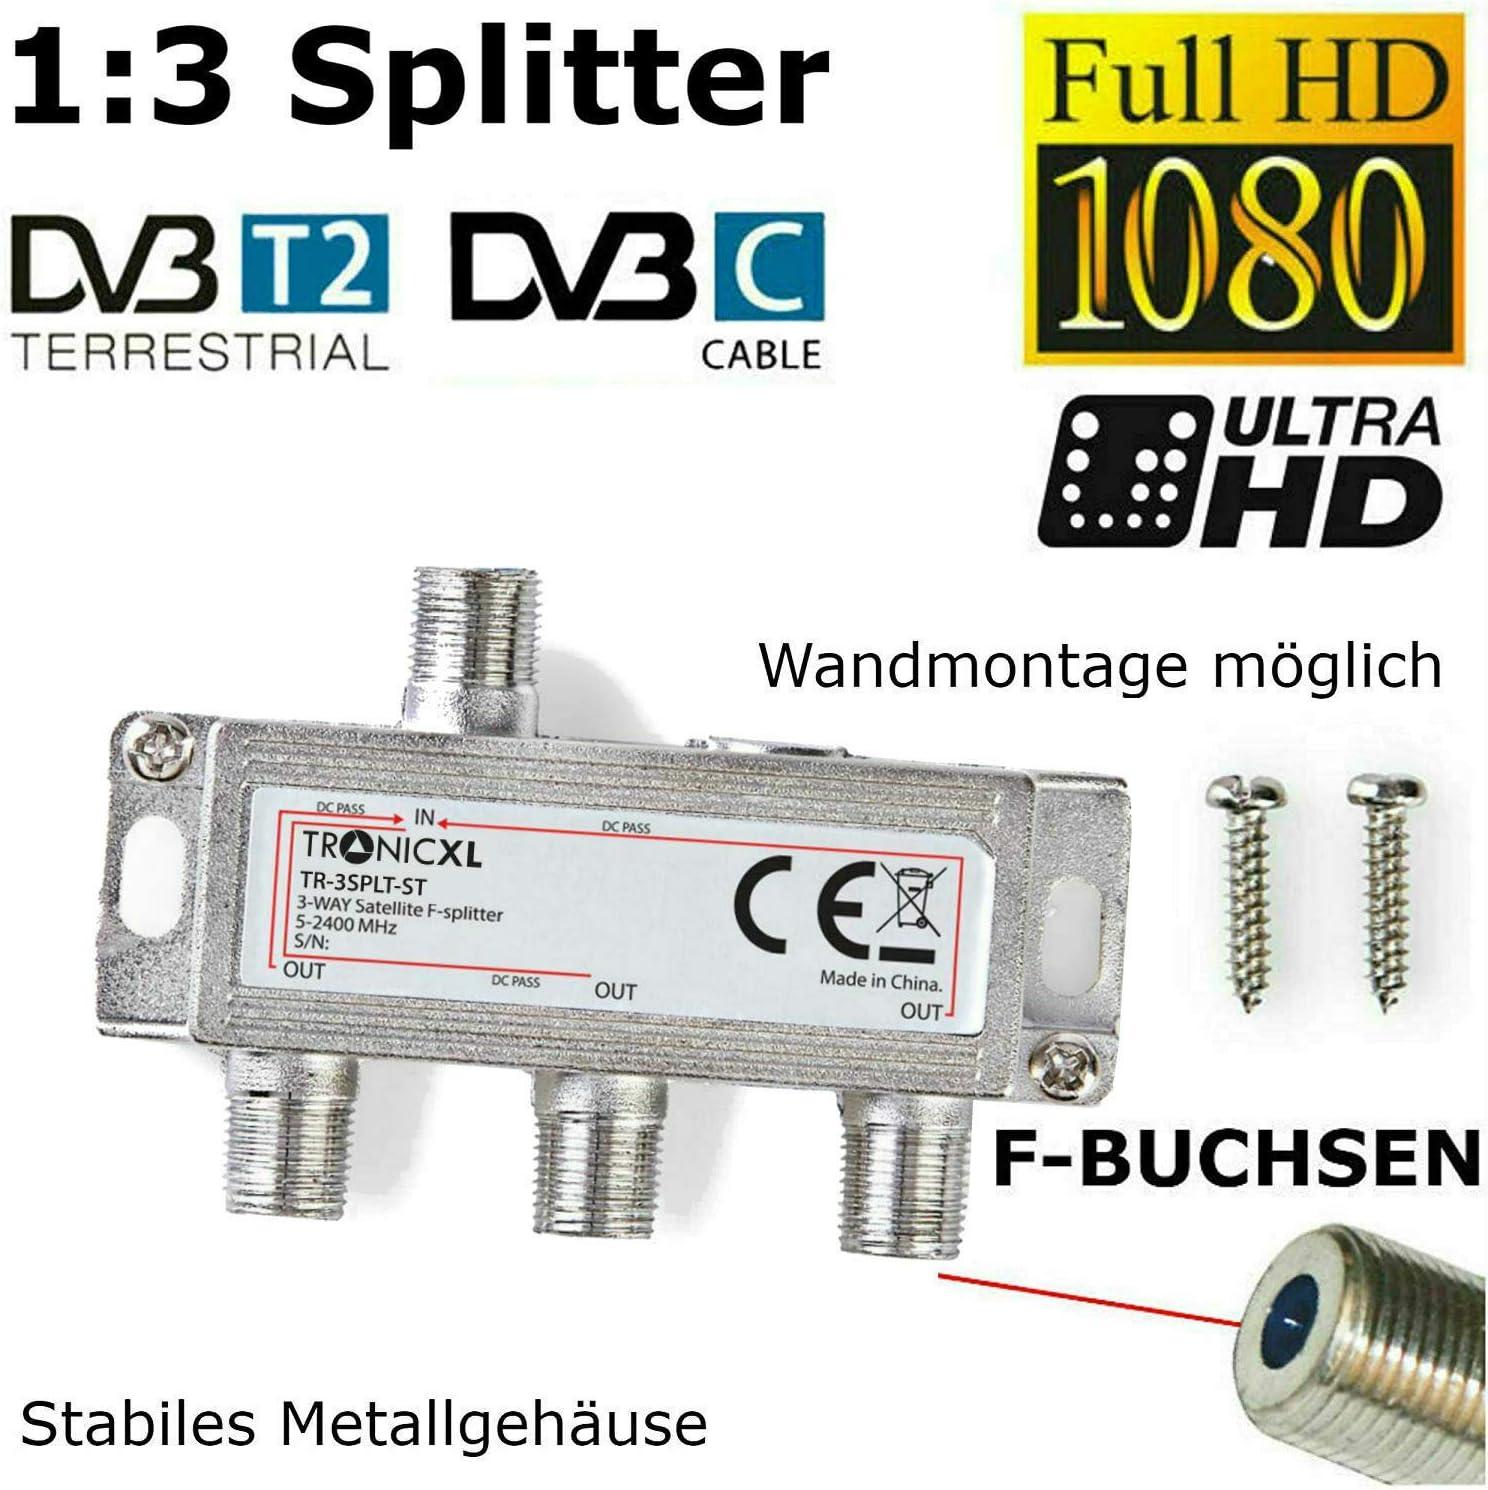 TronicXL Splitter a 3 ingressi per TV Via Cavo DVB-C BK DVB-T2 zb per Unitymedia Germania Vodafone Splitter Unicable HD 3D 4K Digital SAT